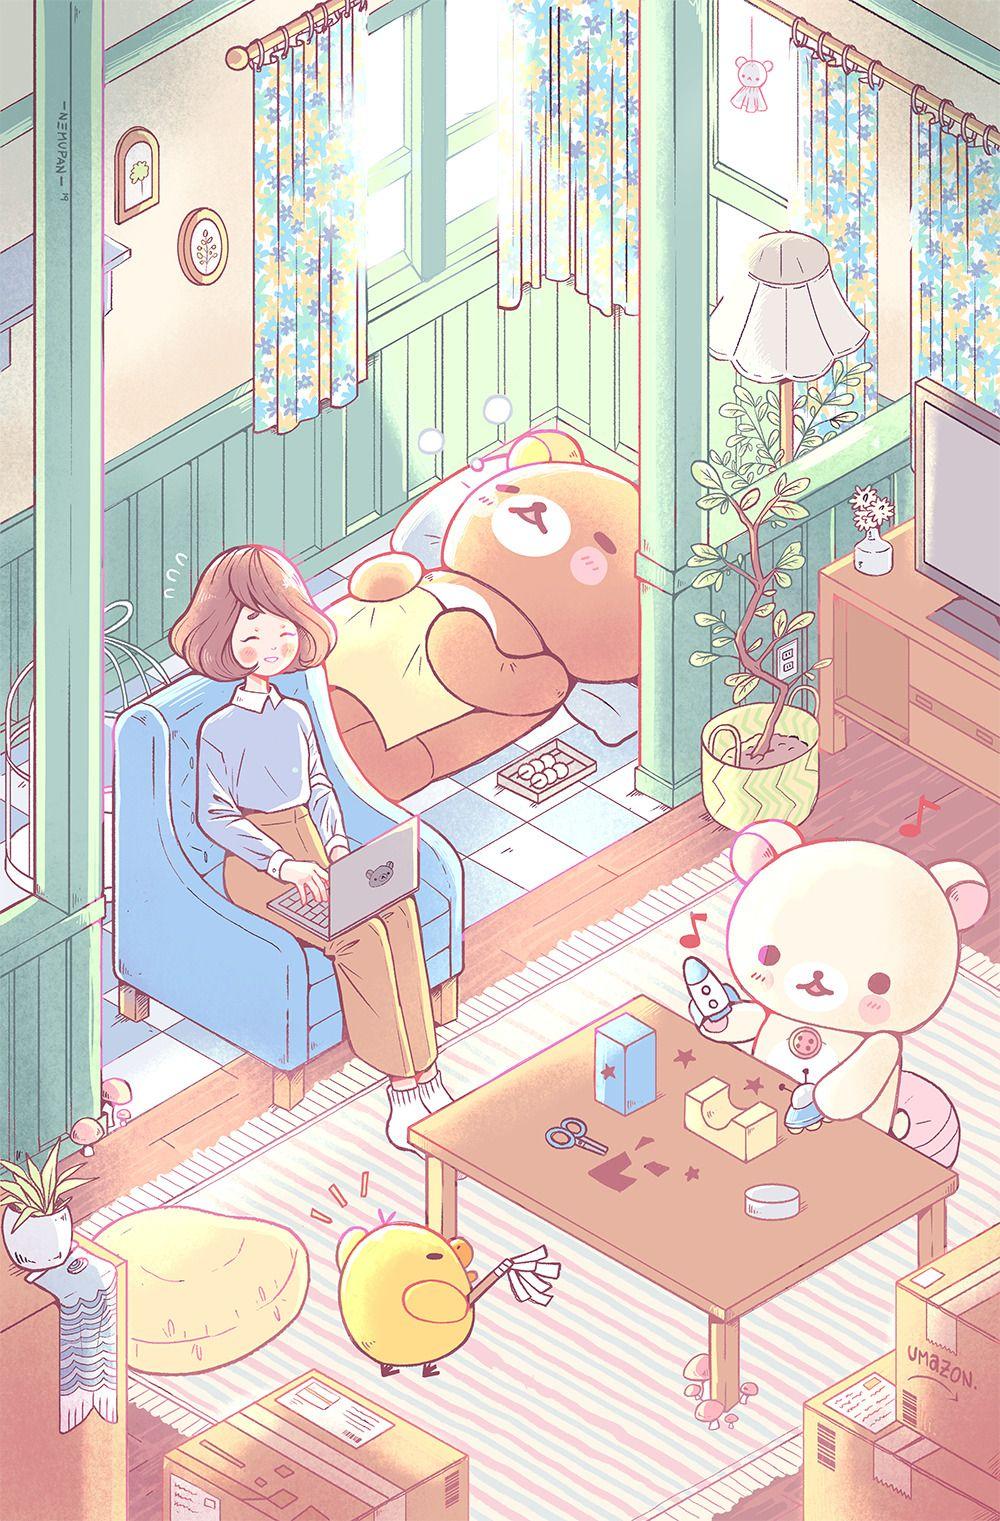 Sumikko Gurashi Characters Cute Japanese Animated Animal Food Characters San X Cute Cartoon Wallpapers Cute Wallpapers Cute Drawings